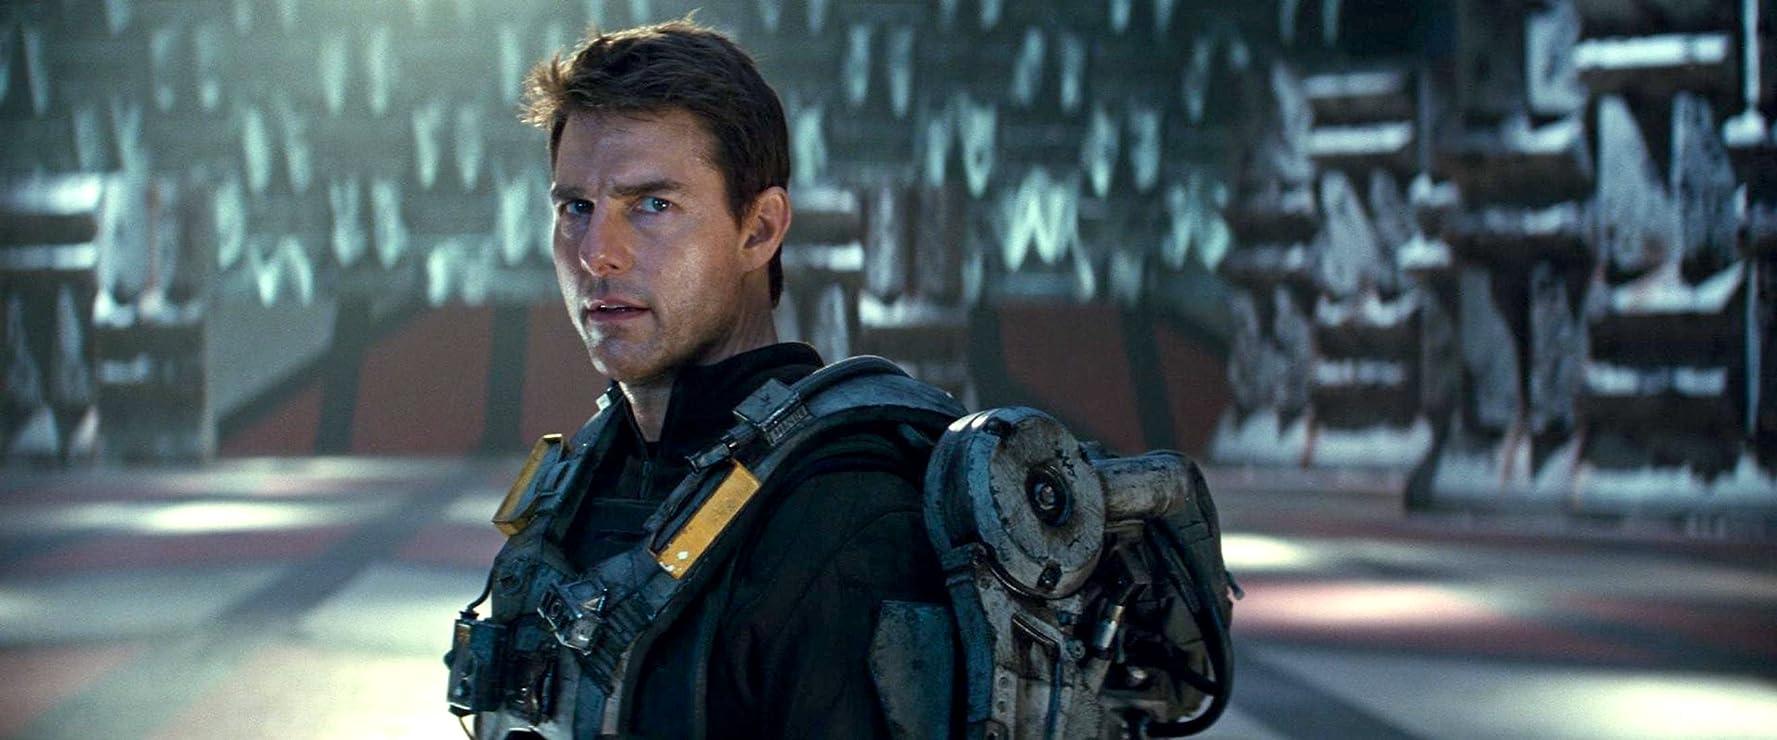 Tom Cruise dalam film Edge of Tomorrow.